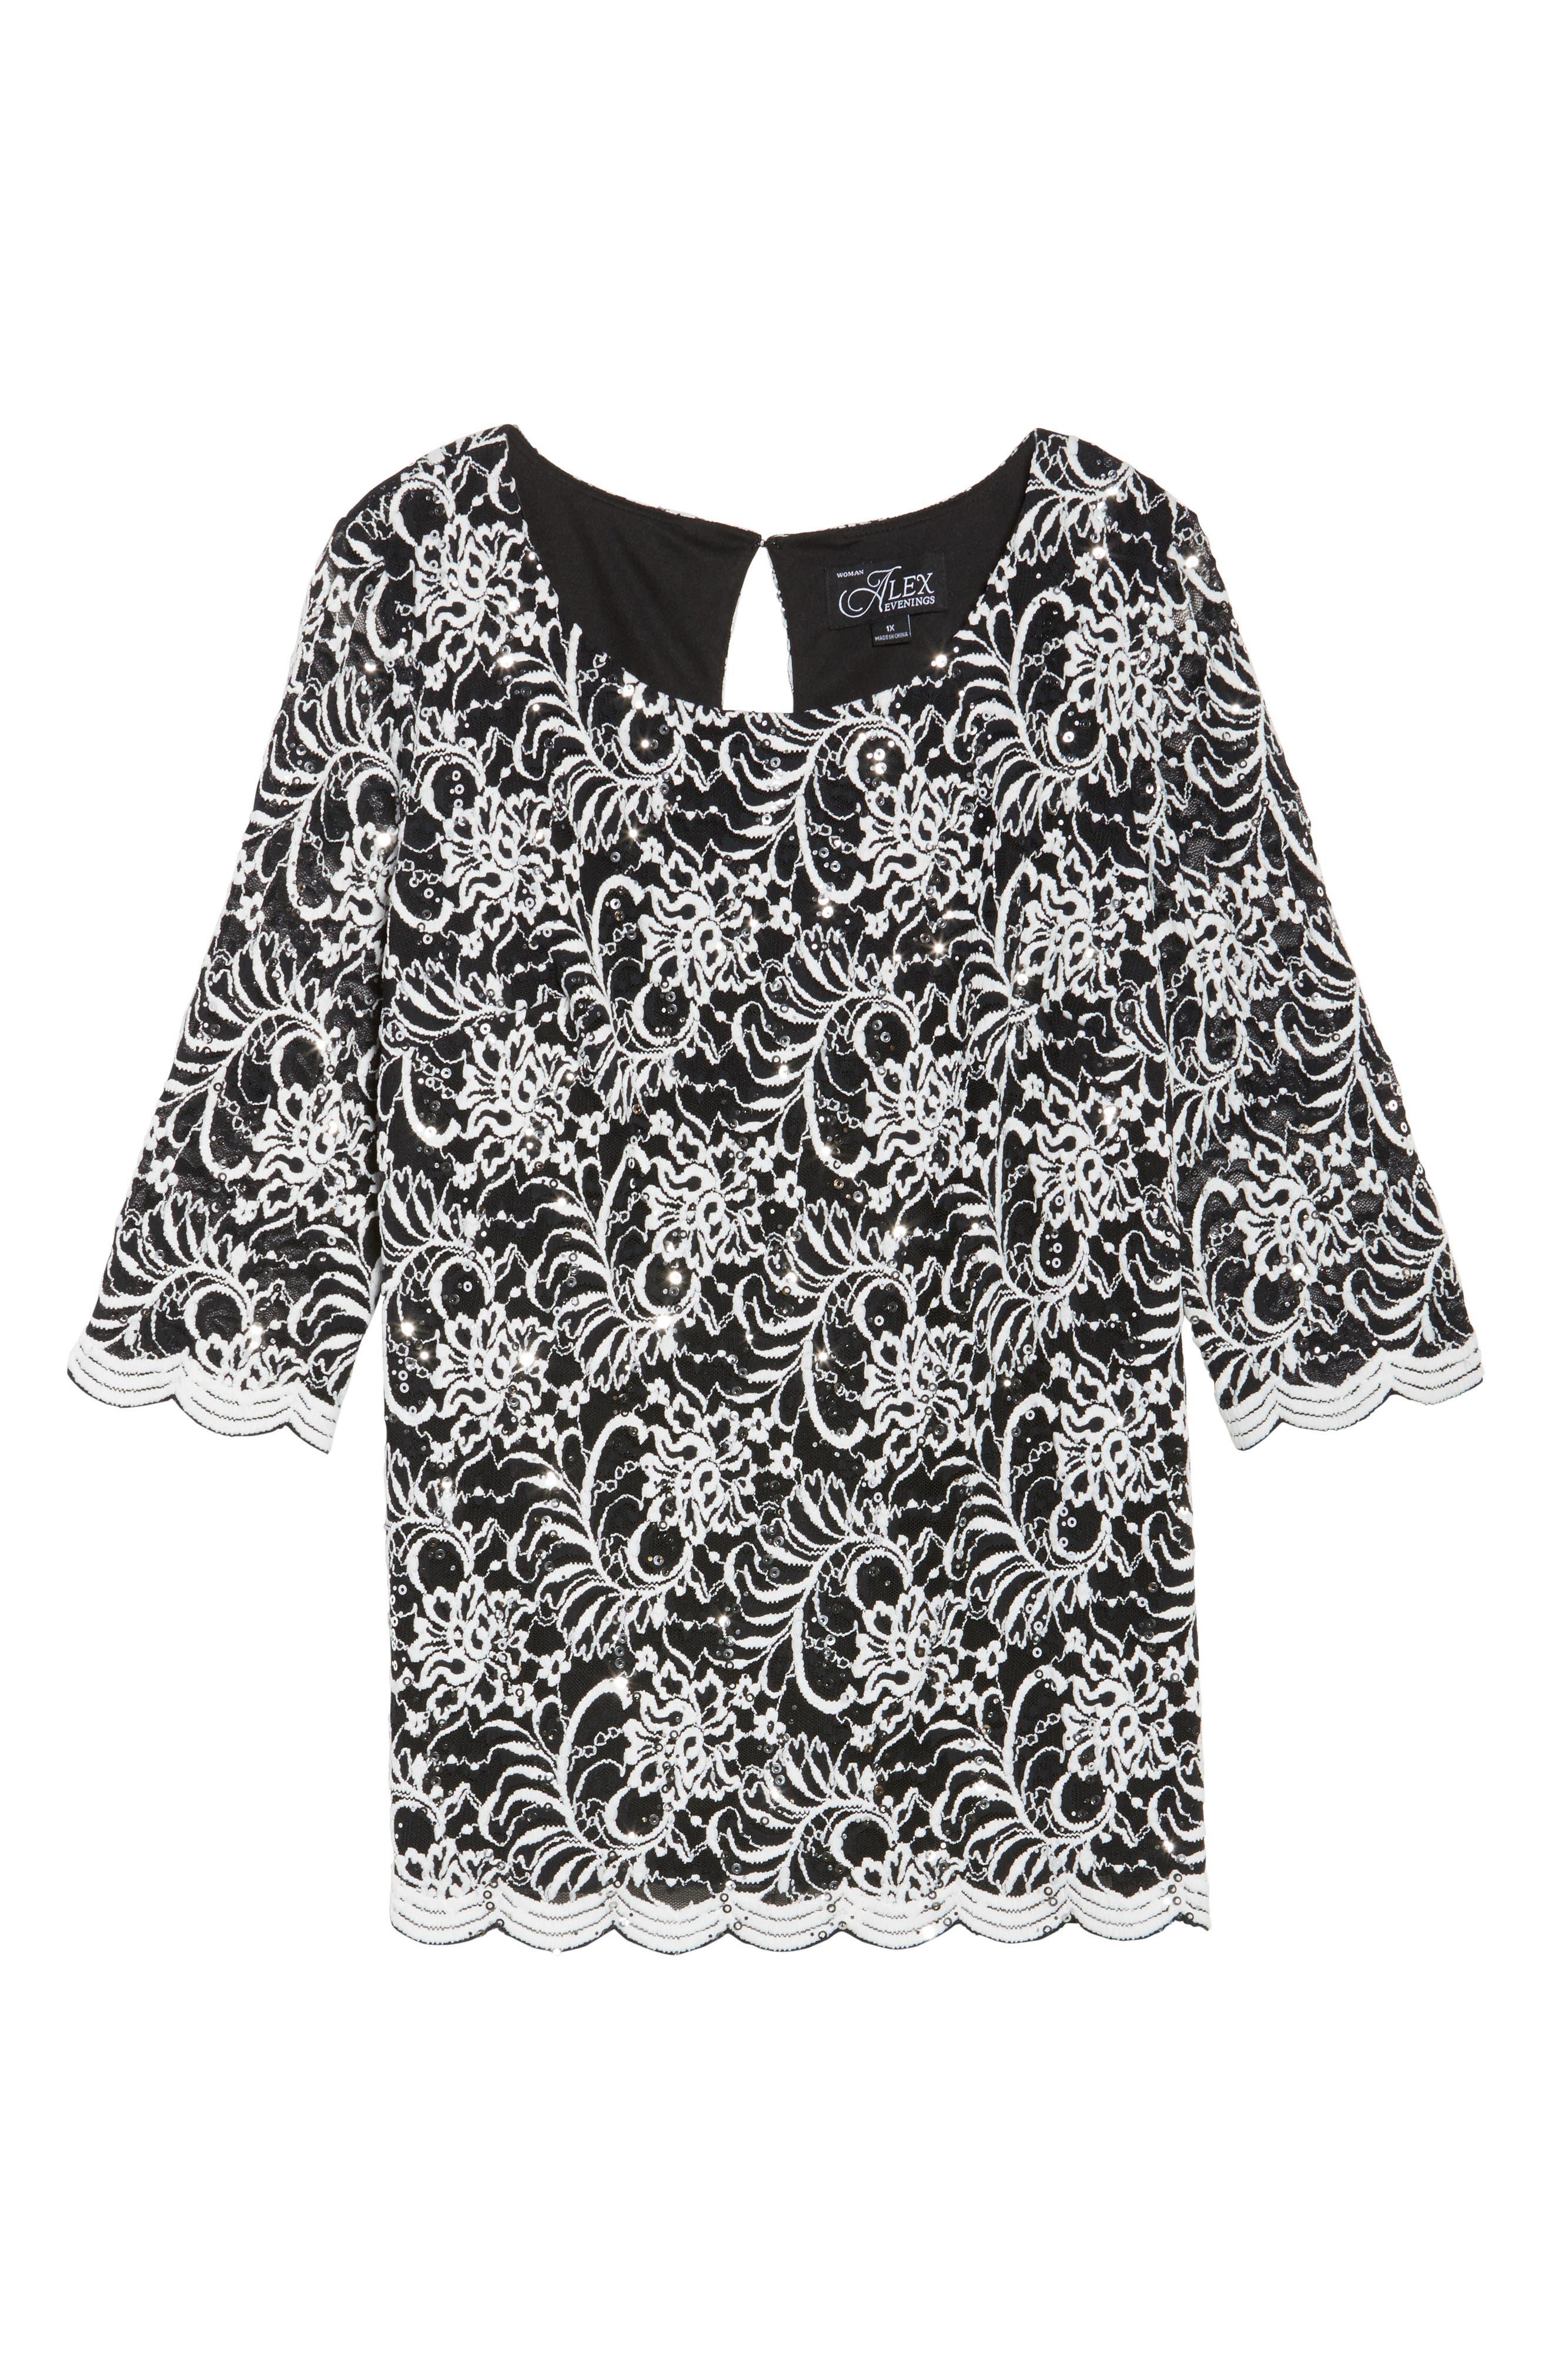 Embroidered Tulle Blouse,                             Alternate thumbnail 6, color,                             Black/ White